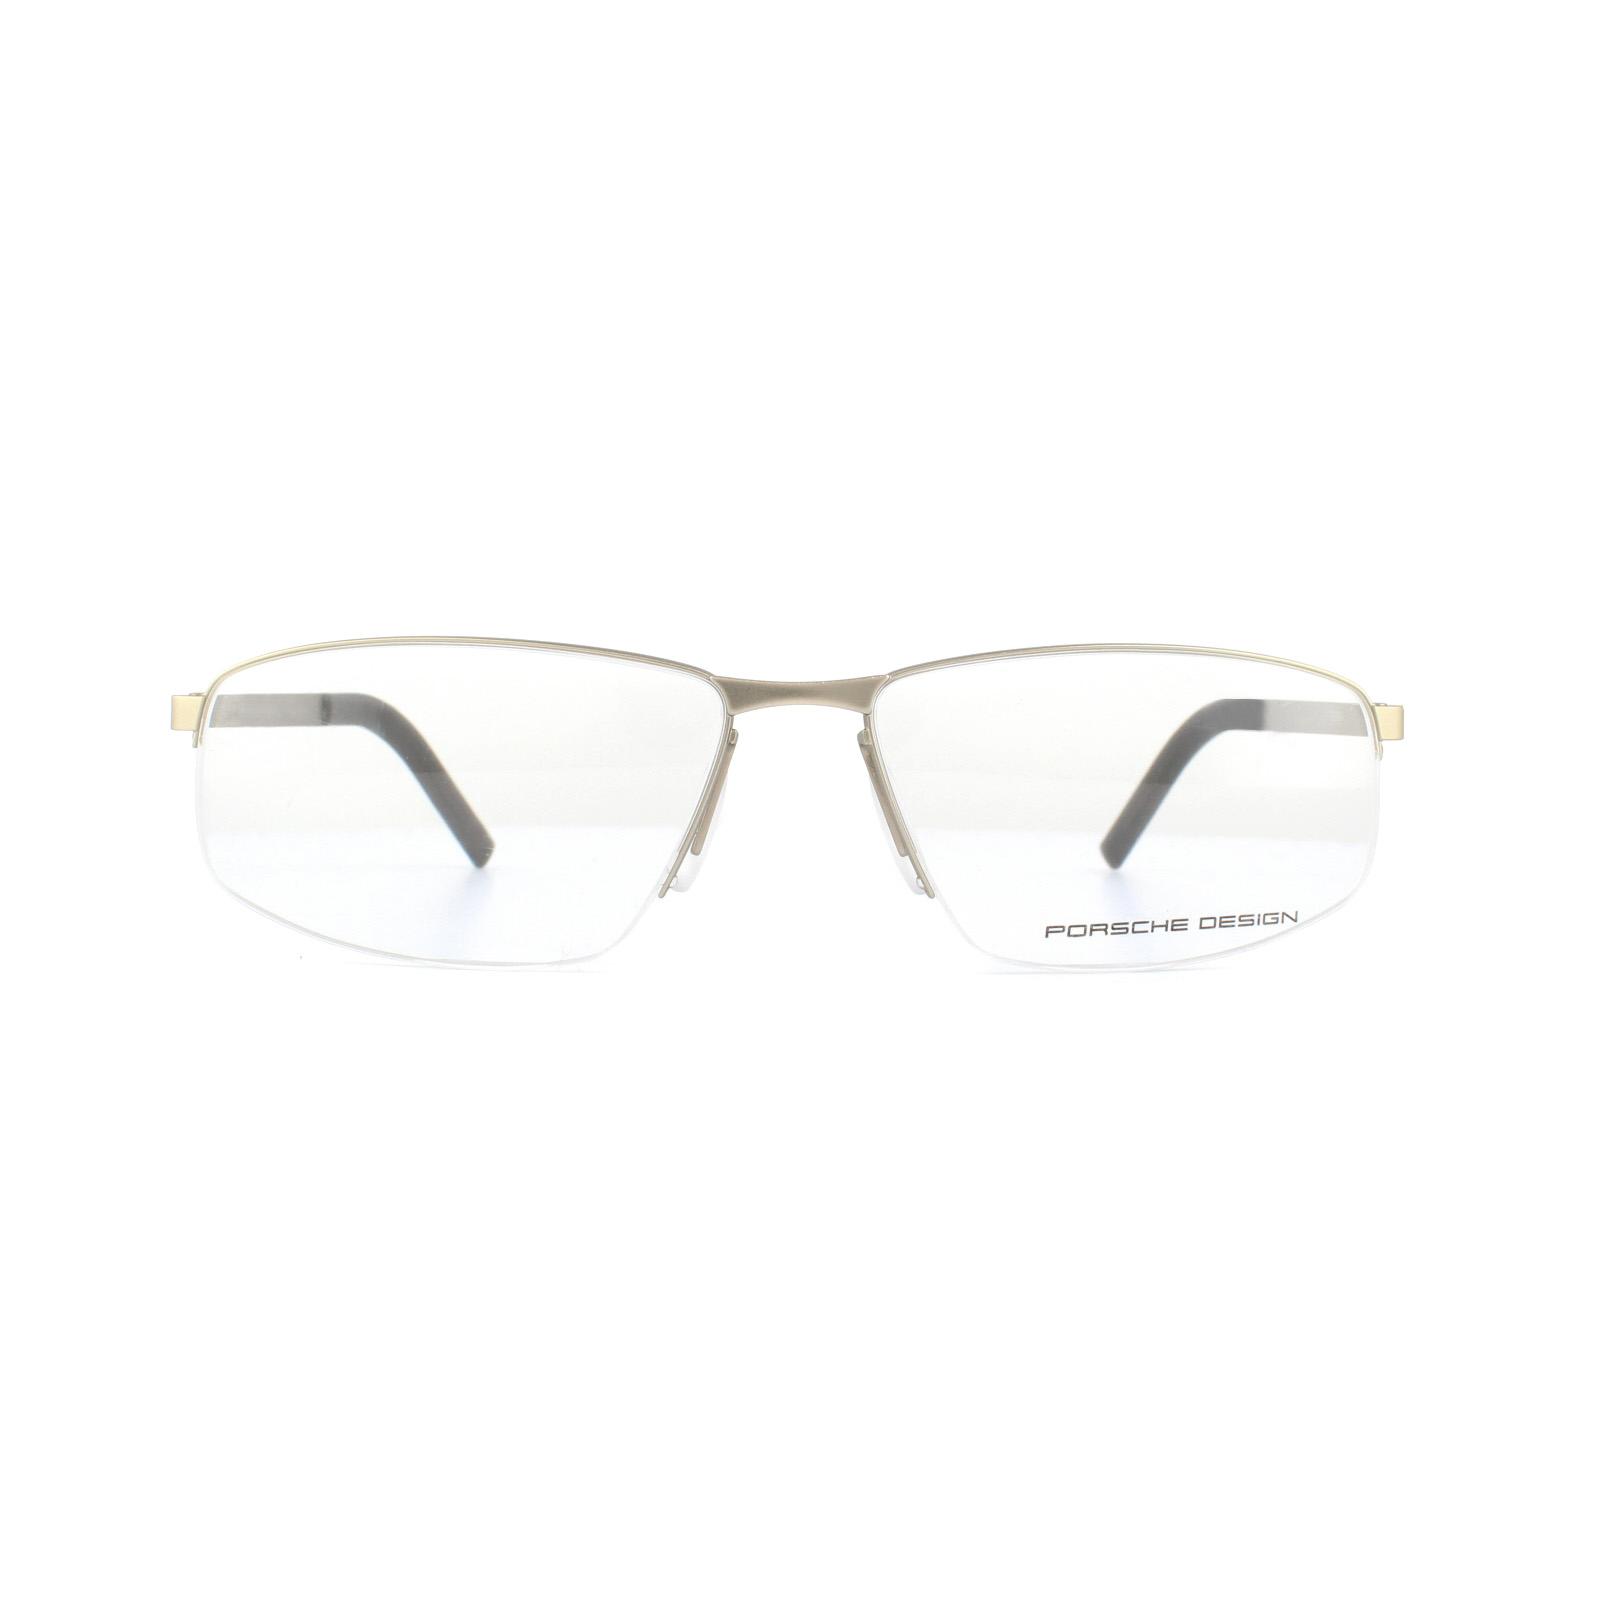 96471ec6e1ed Porsche Design Glasses Frames P8284 B Light Gold 59mm 4046901416881 ...